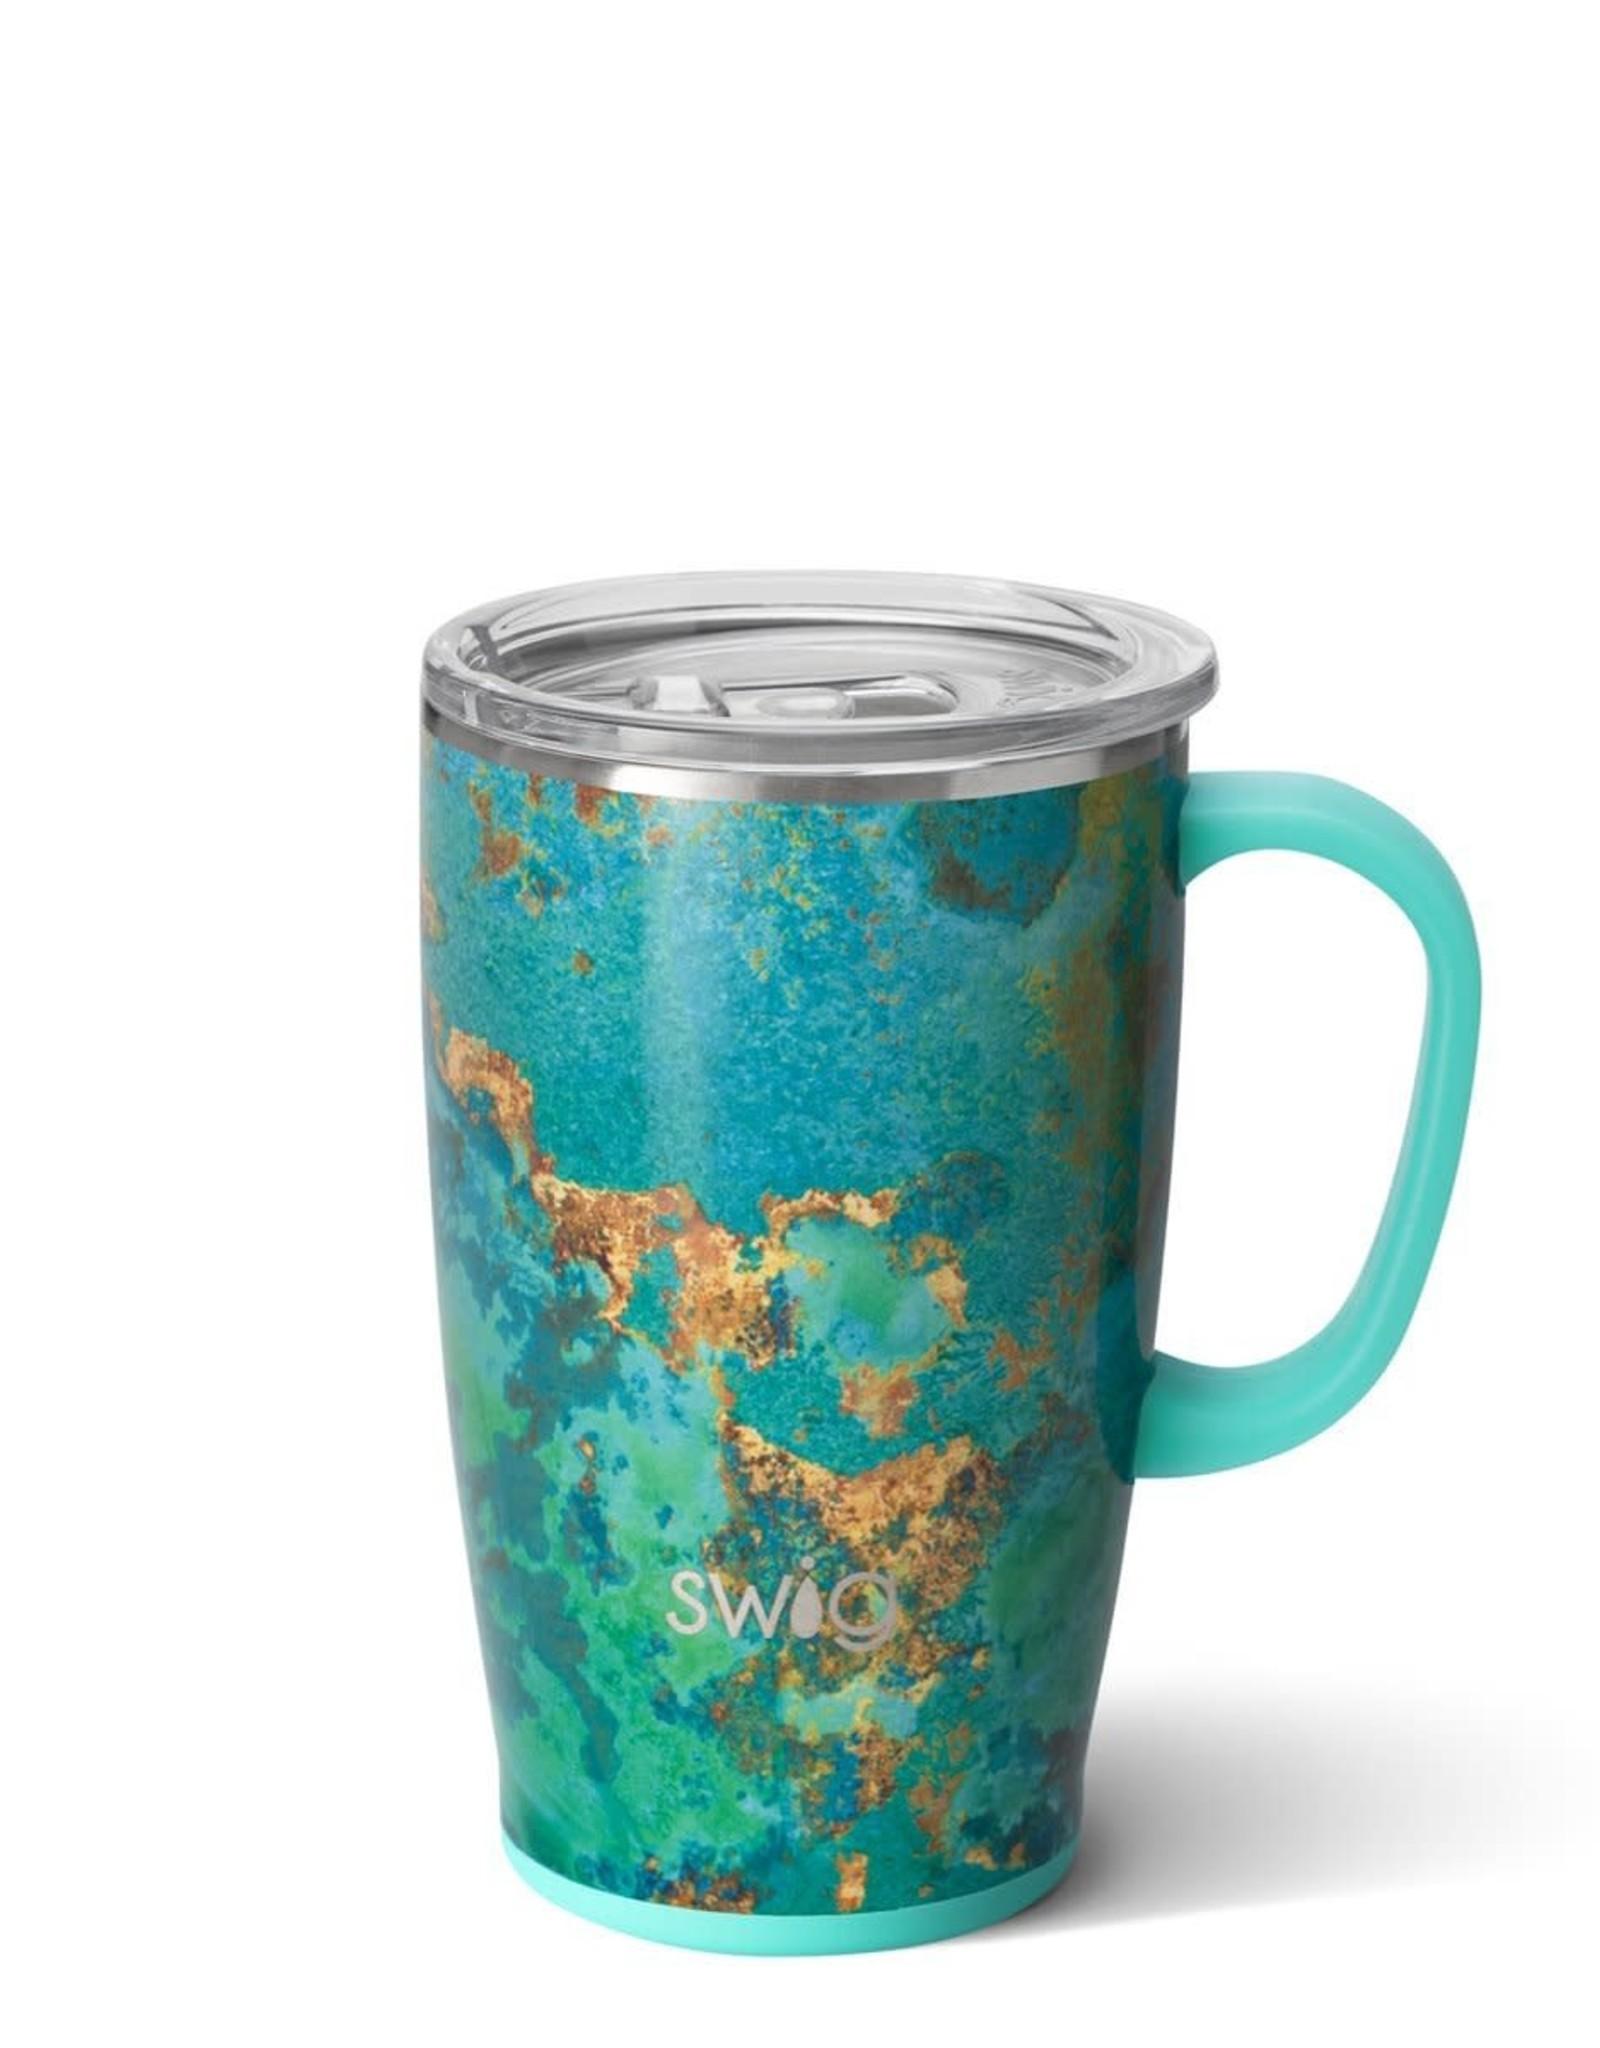 Swig Swig Drinkware Copper Patina